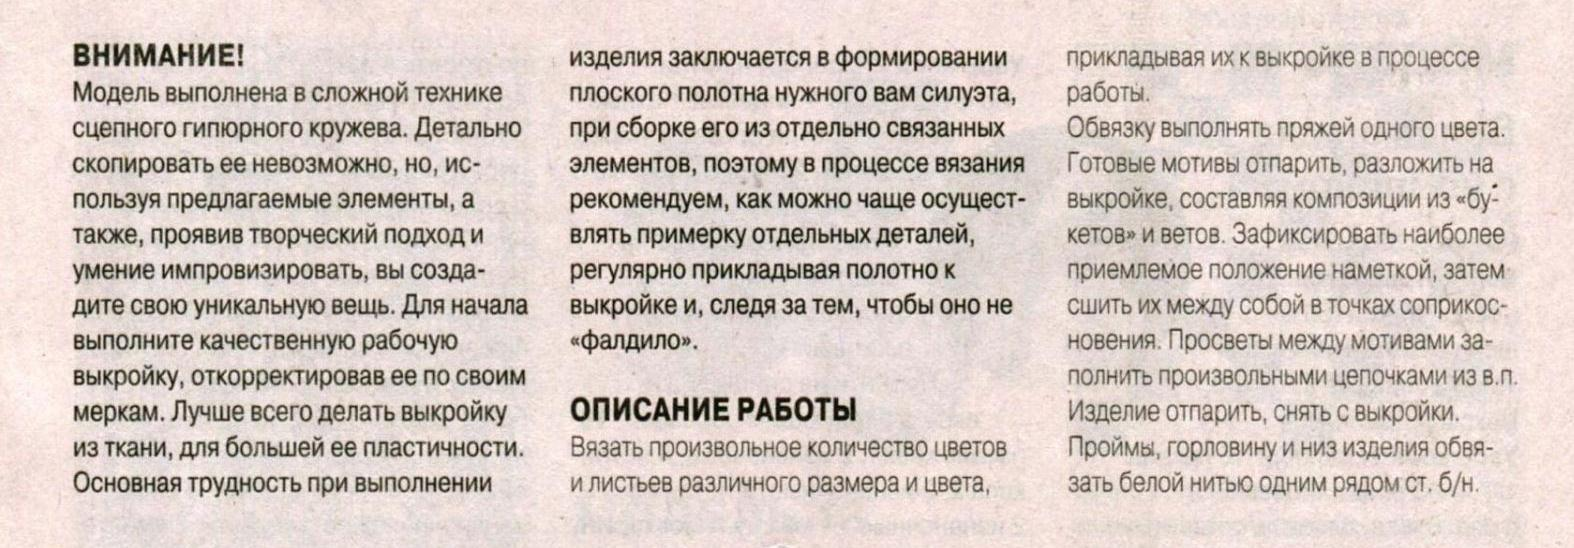 1377_klybok18-15_10 (4)